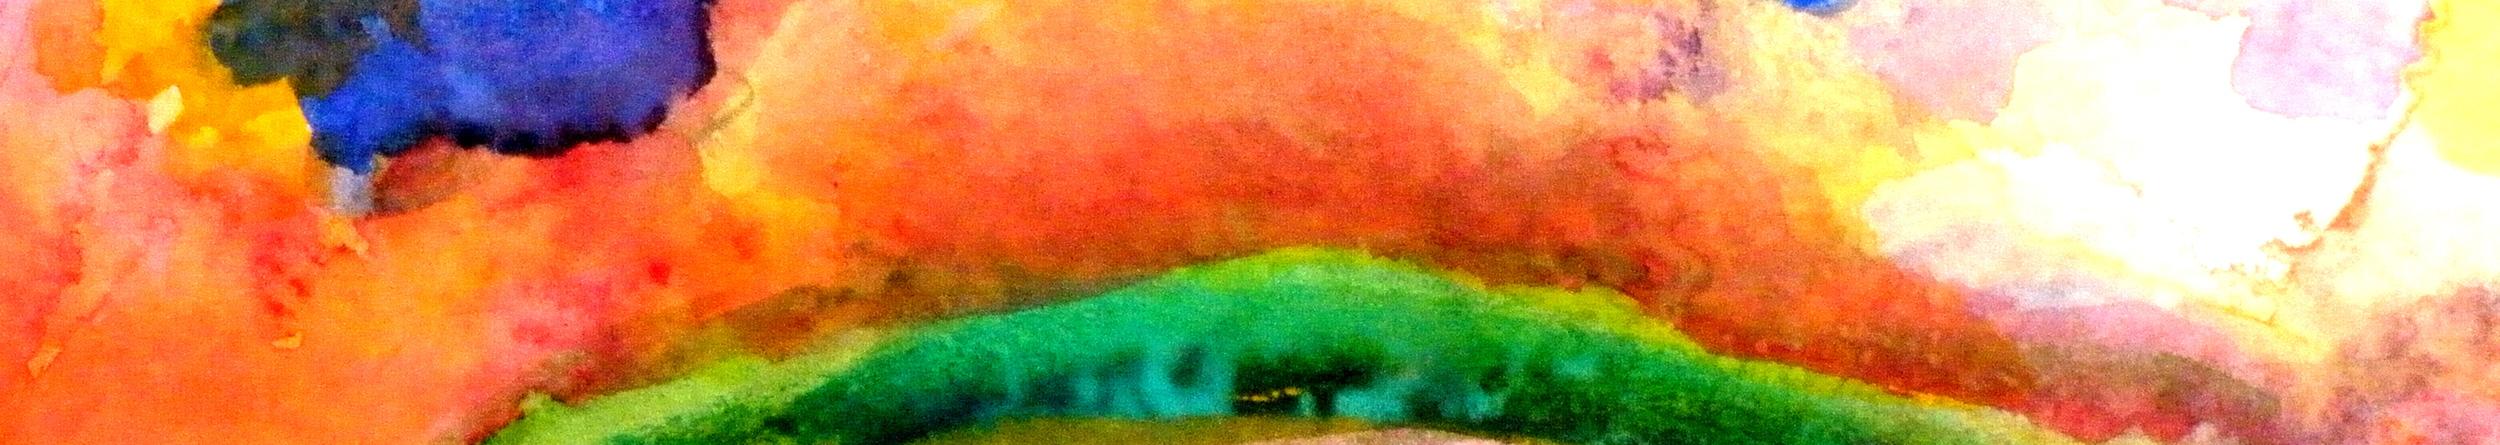 Watercolor by Michael P. Pitek, III